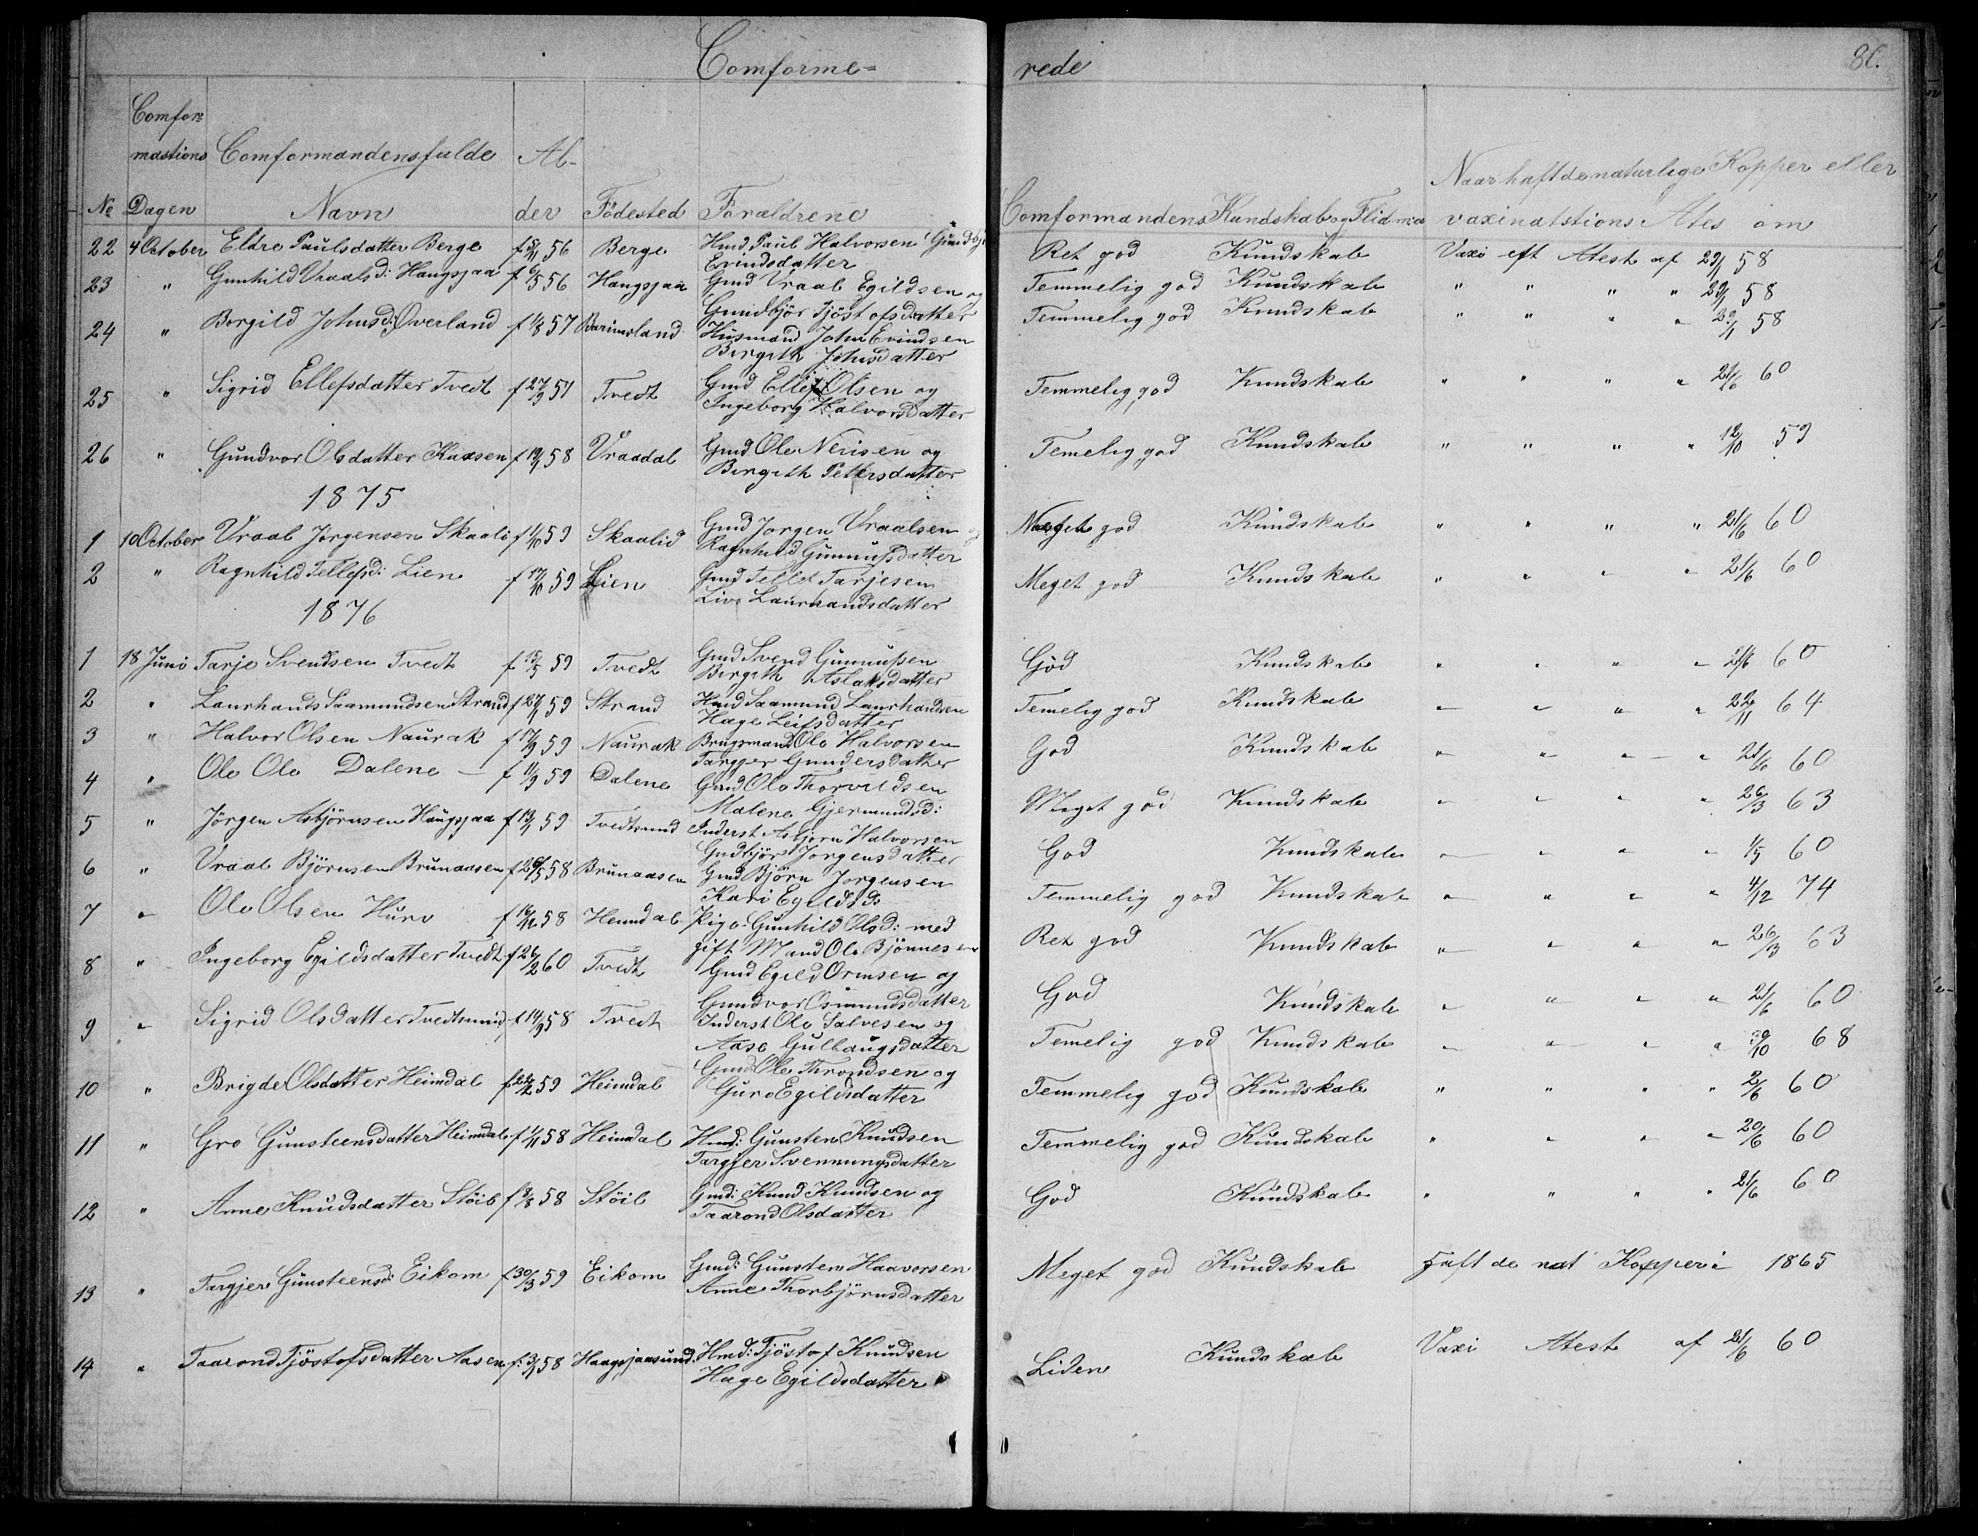 SAKO, Nissedal kirkebøker, G/Gb/L0002: Klokkerbok nr. II 2, 1863-1892, s. 80